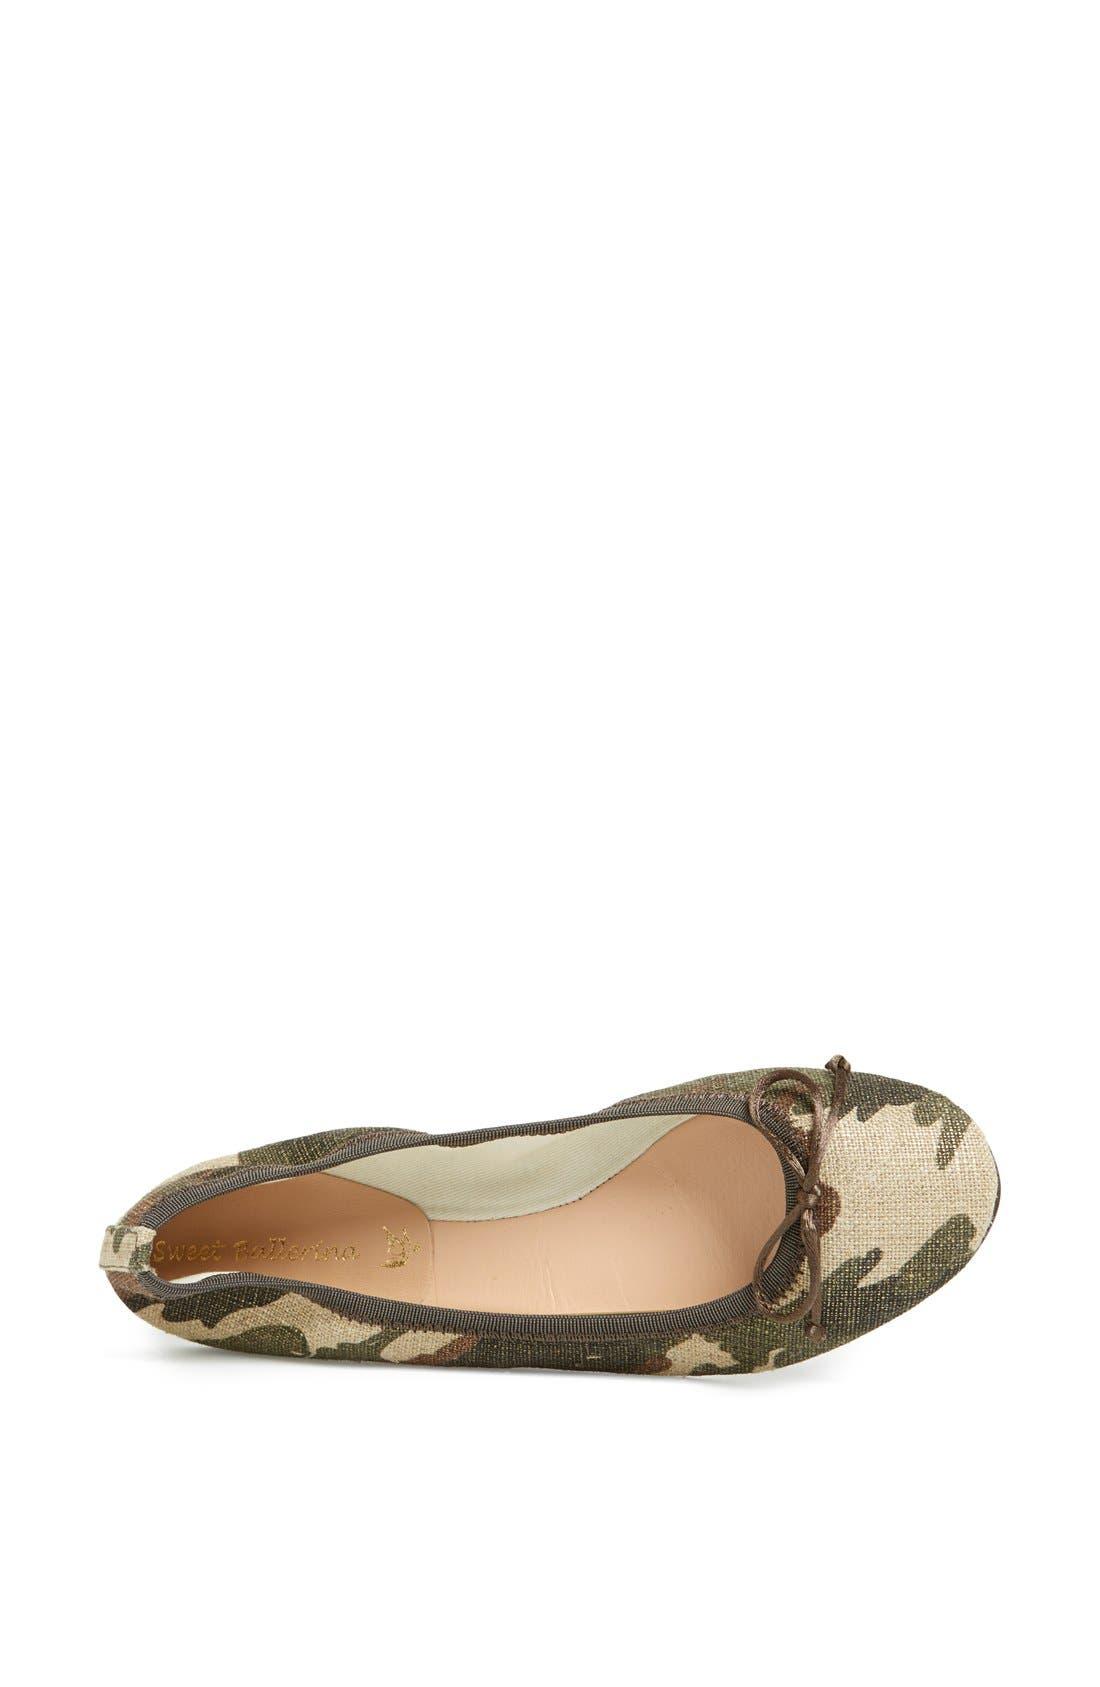 Camouflage Ballet Flat,                             Alternate thumbnail 4, color,                             340